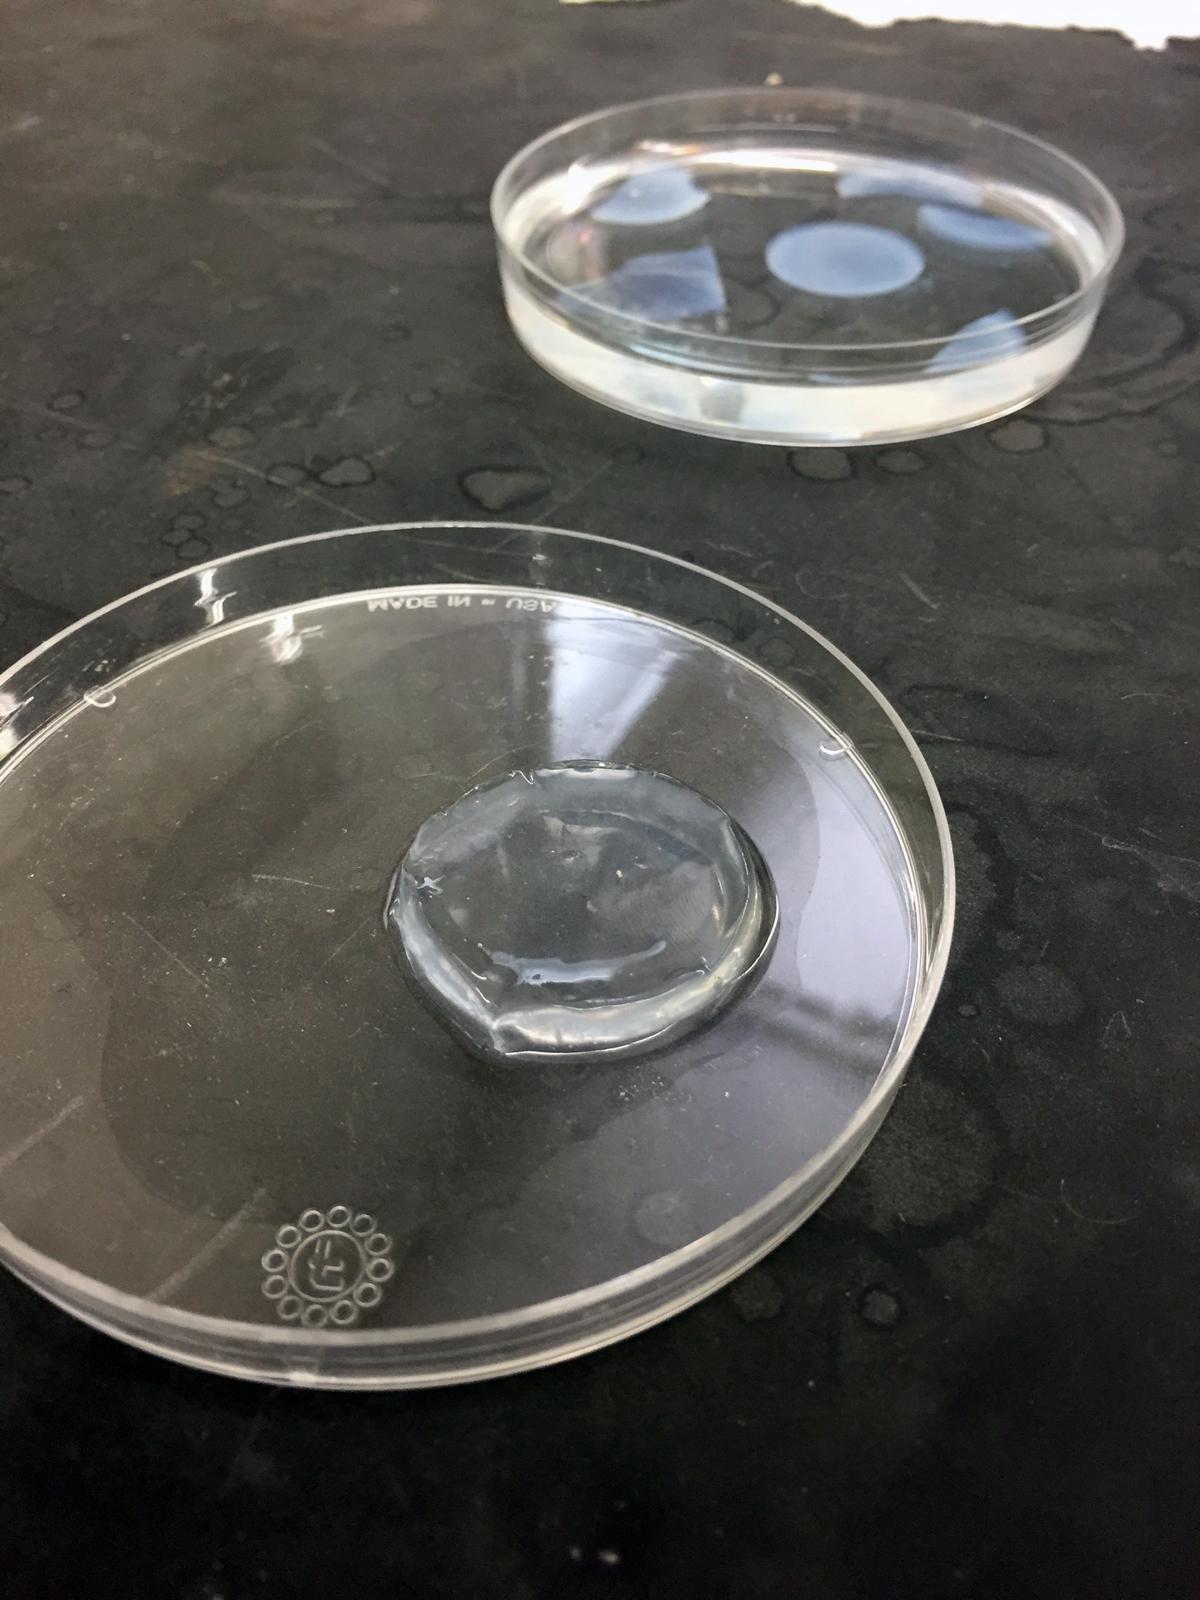 biobots 3D printed biomaterial at university of denver via The 3D Printing Store 3D printing industry